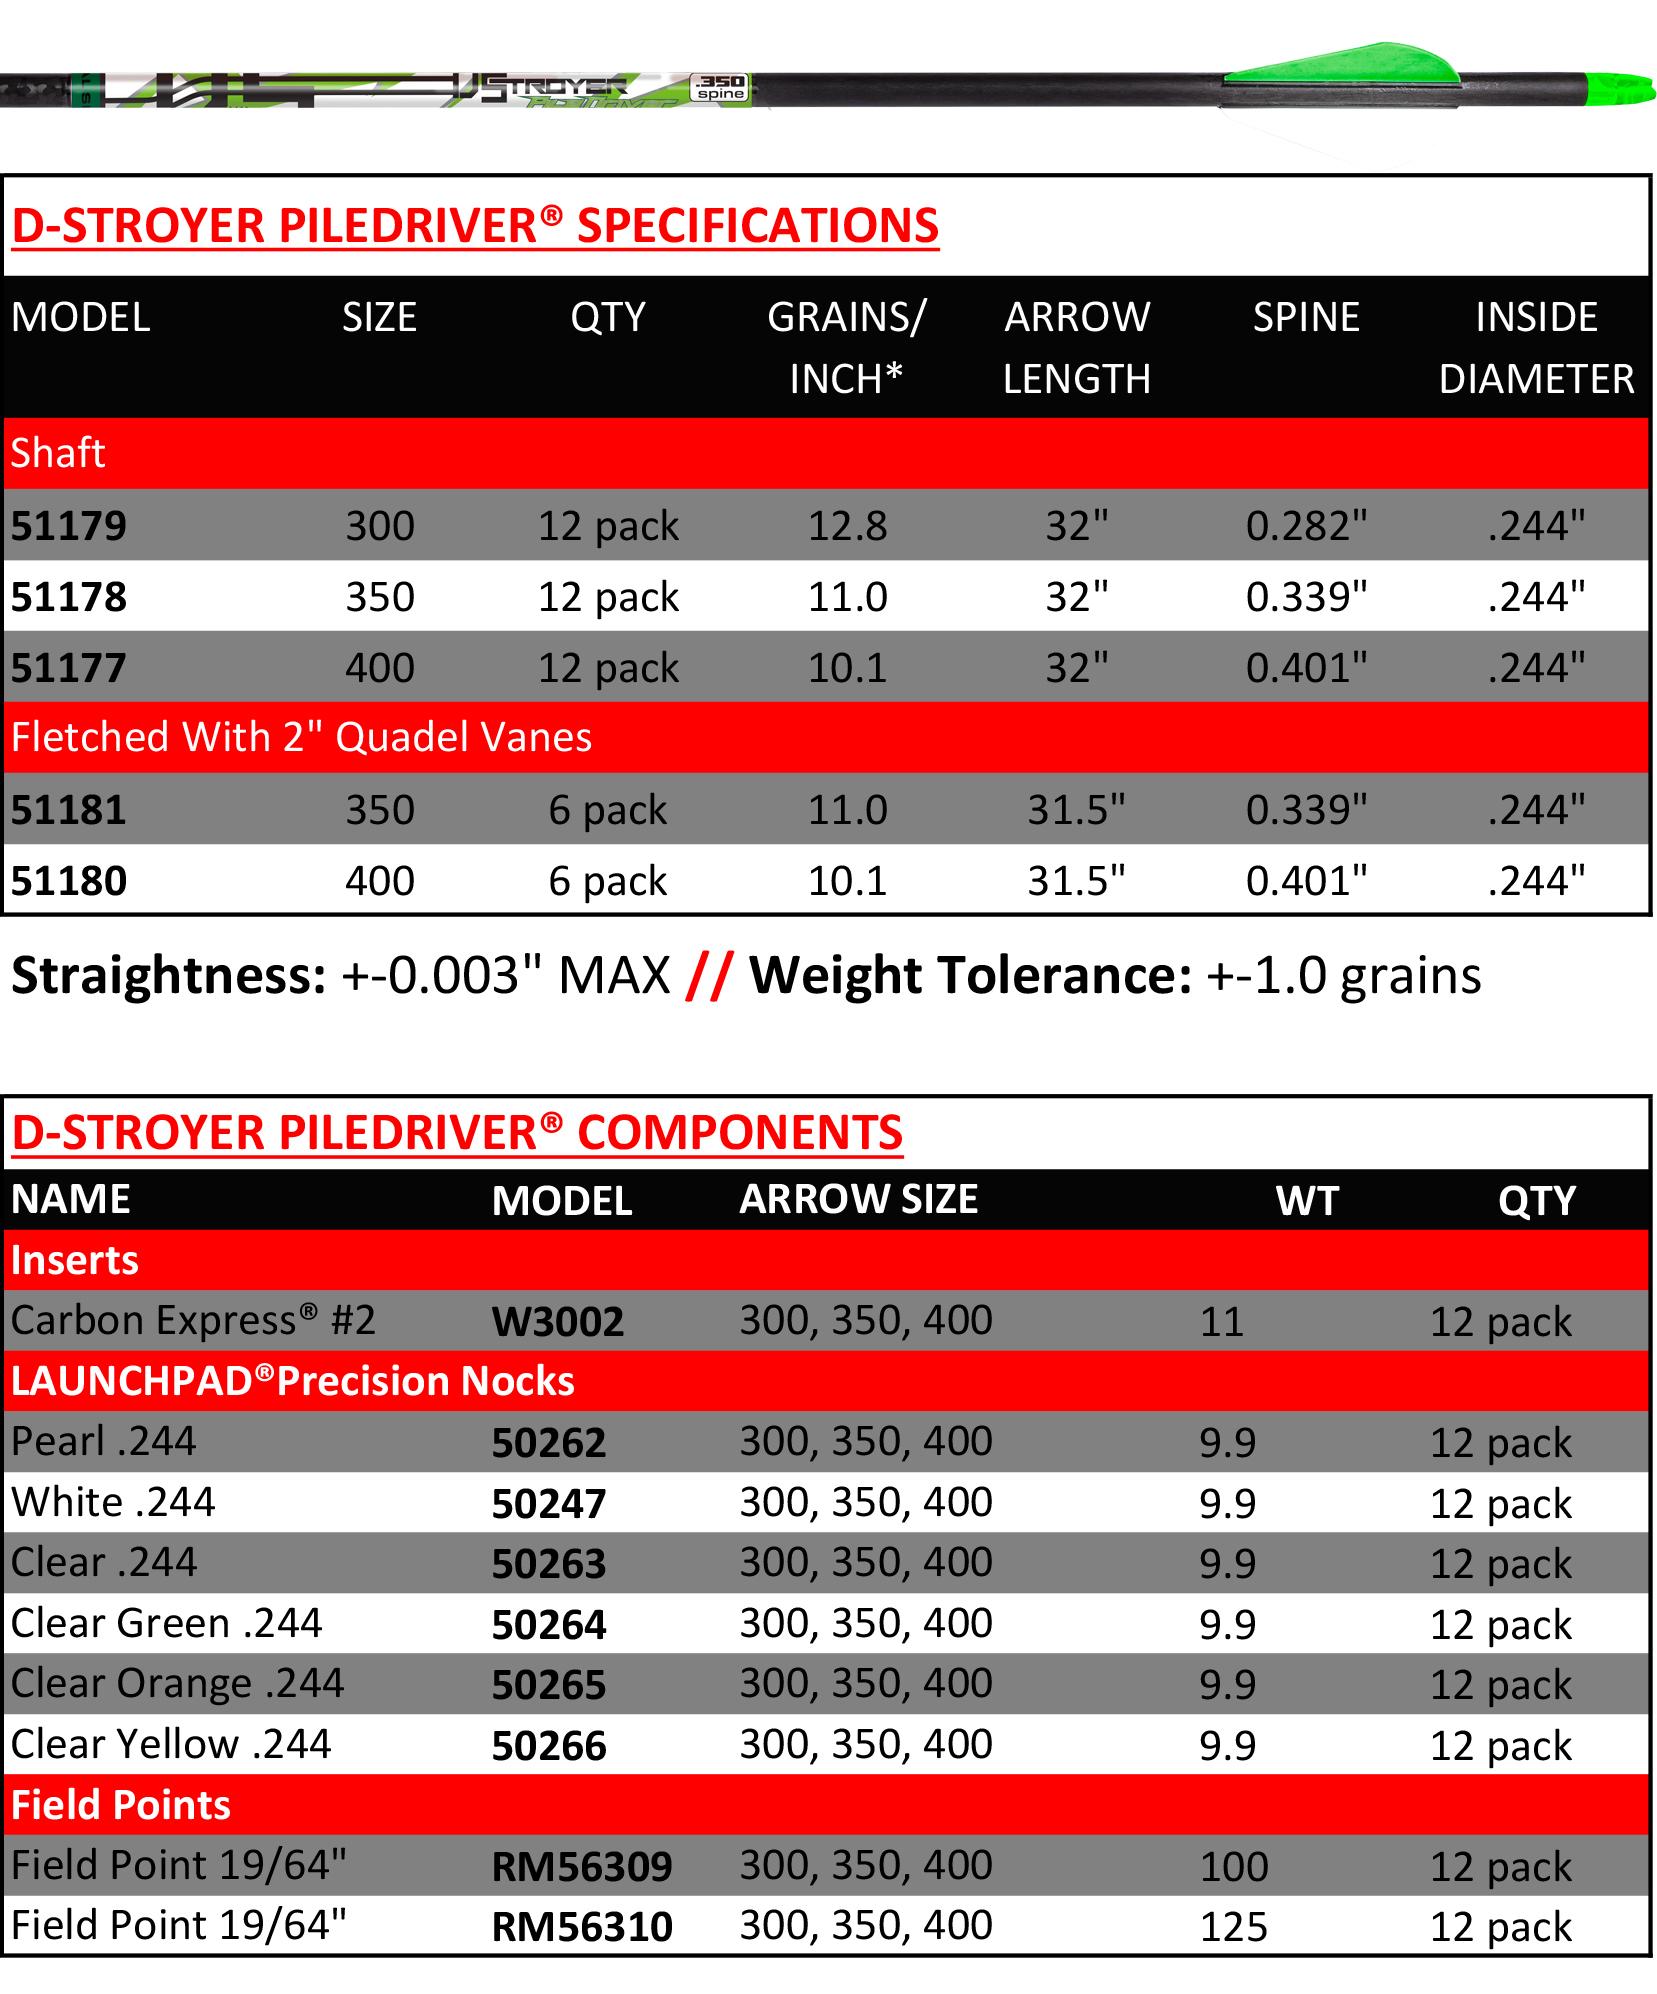 cx d-stroyer piledriver chart